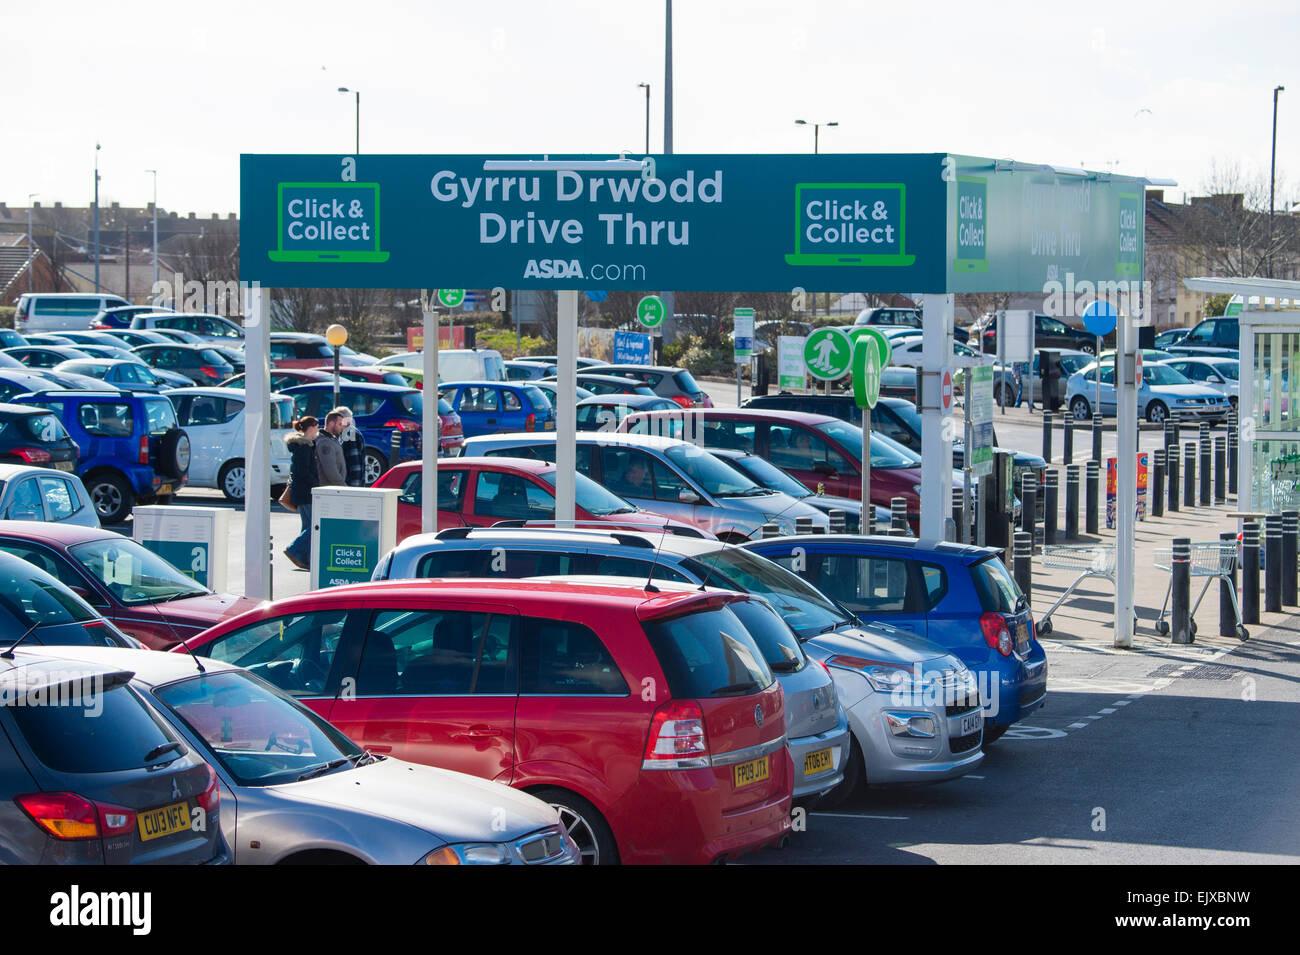 Welsh bilingue Lingua inglese digital signage sulla 'Drive Thru / Gyrru Drwodd' fare clic e raccogliere Immagini Stock